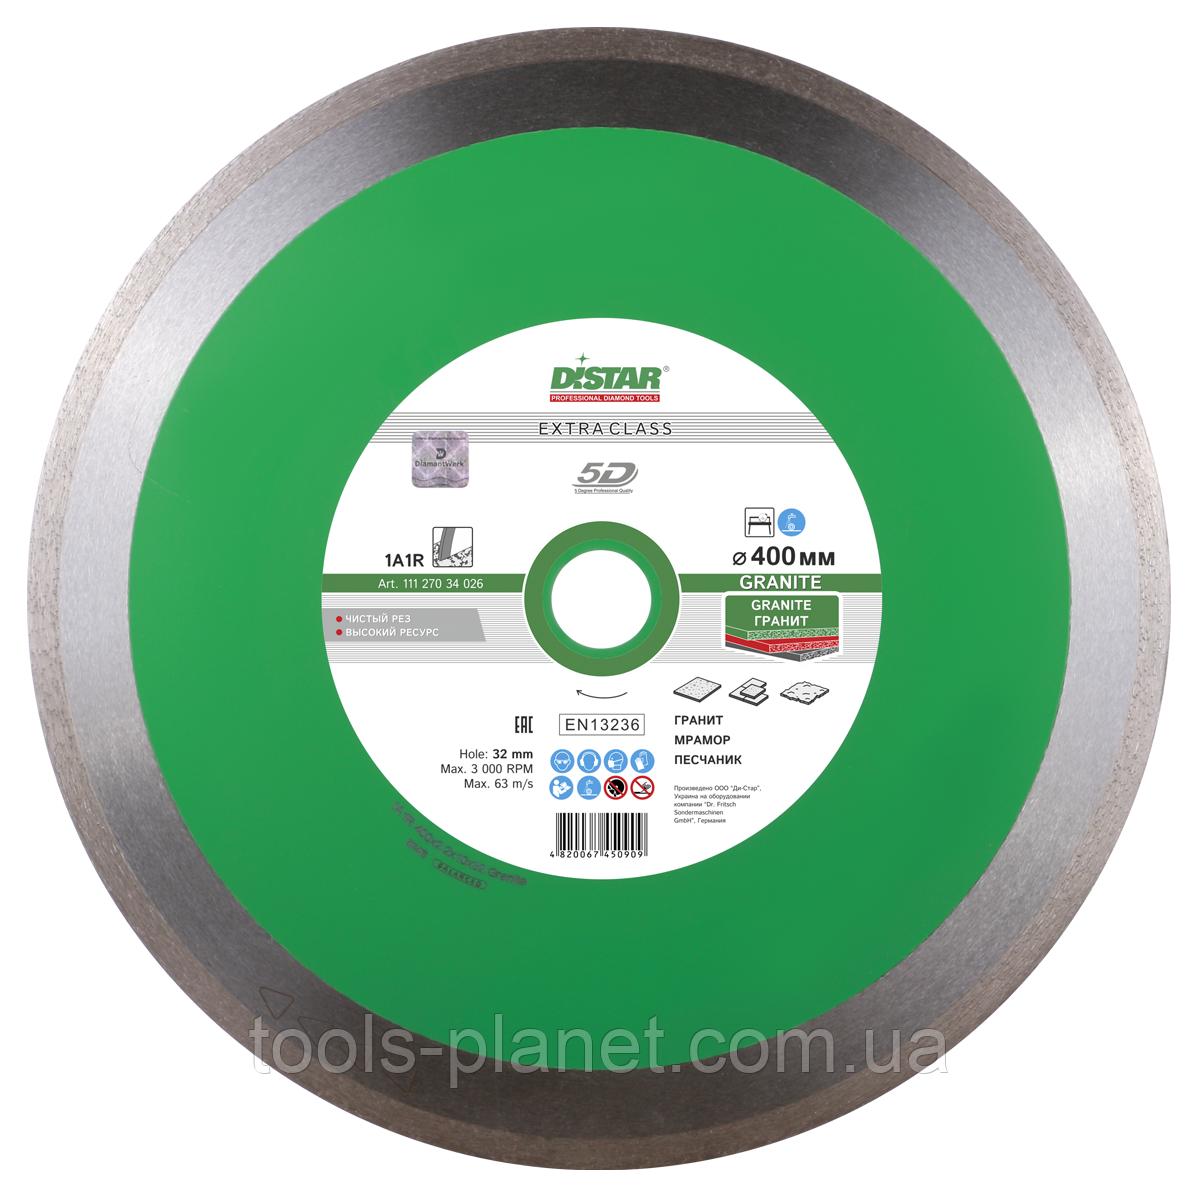 Алмазный диск Distar 1A1R 400 x 2,2 x 10 x 32 Granite 5D (11127034026)